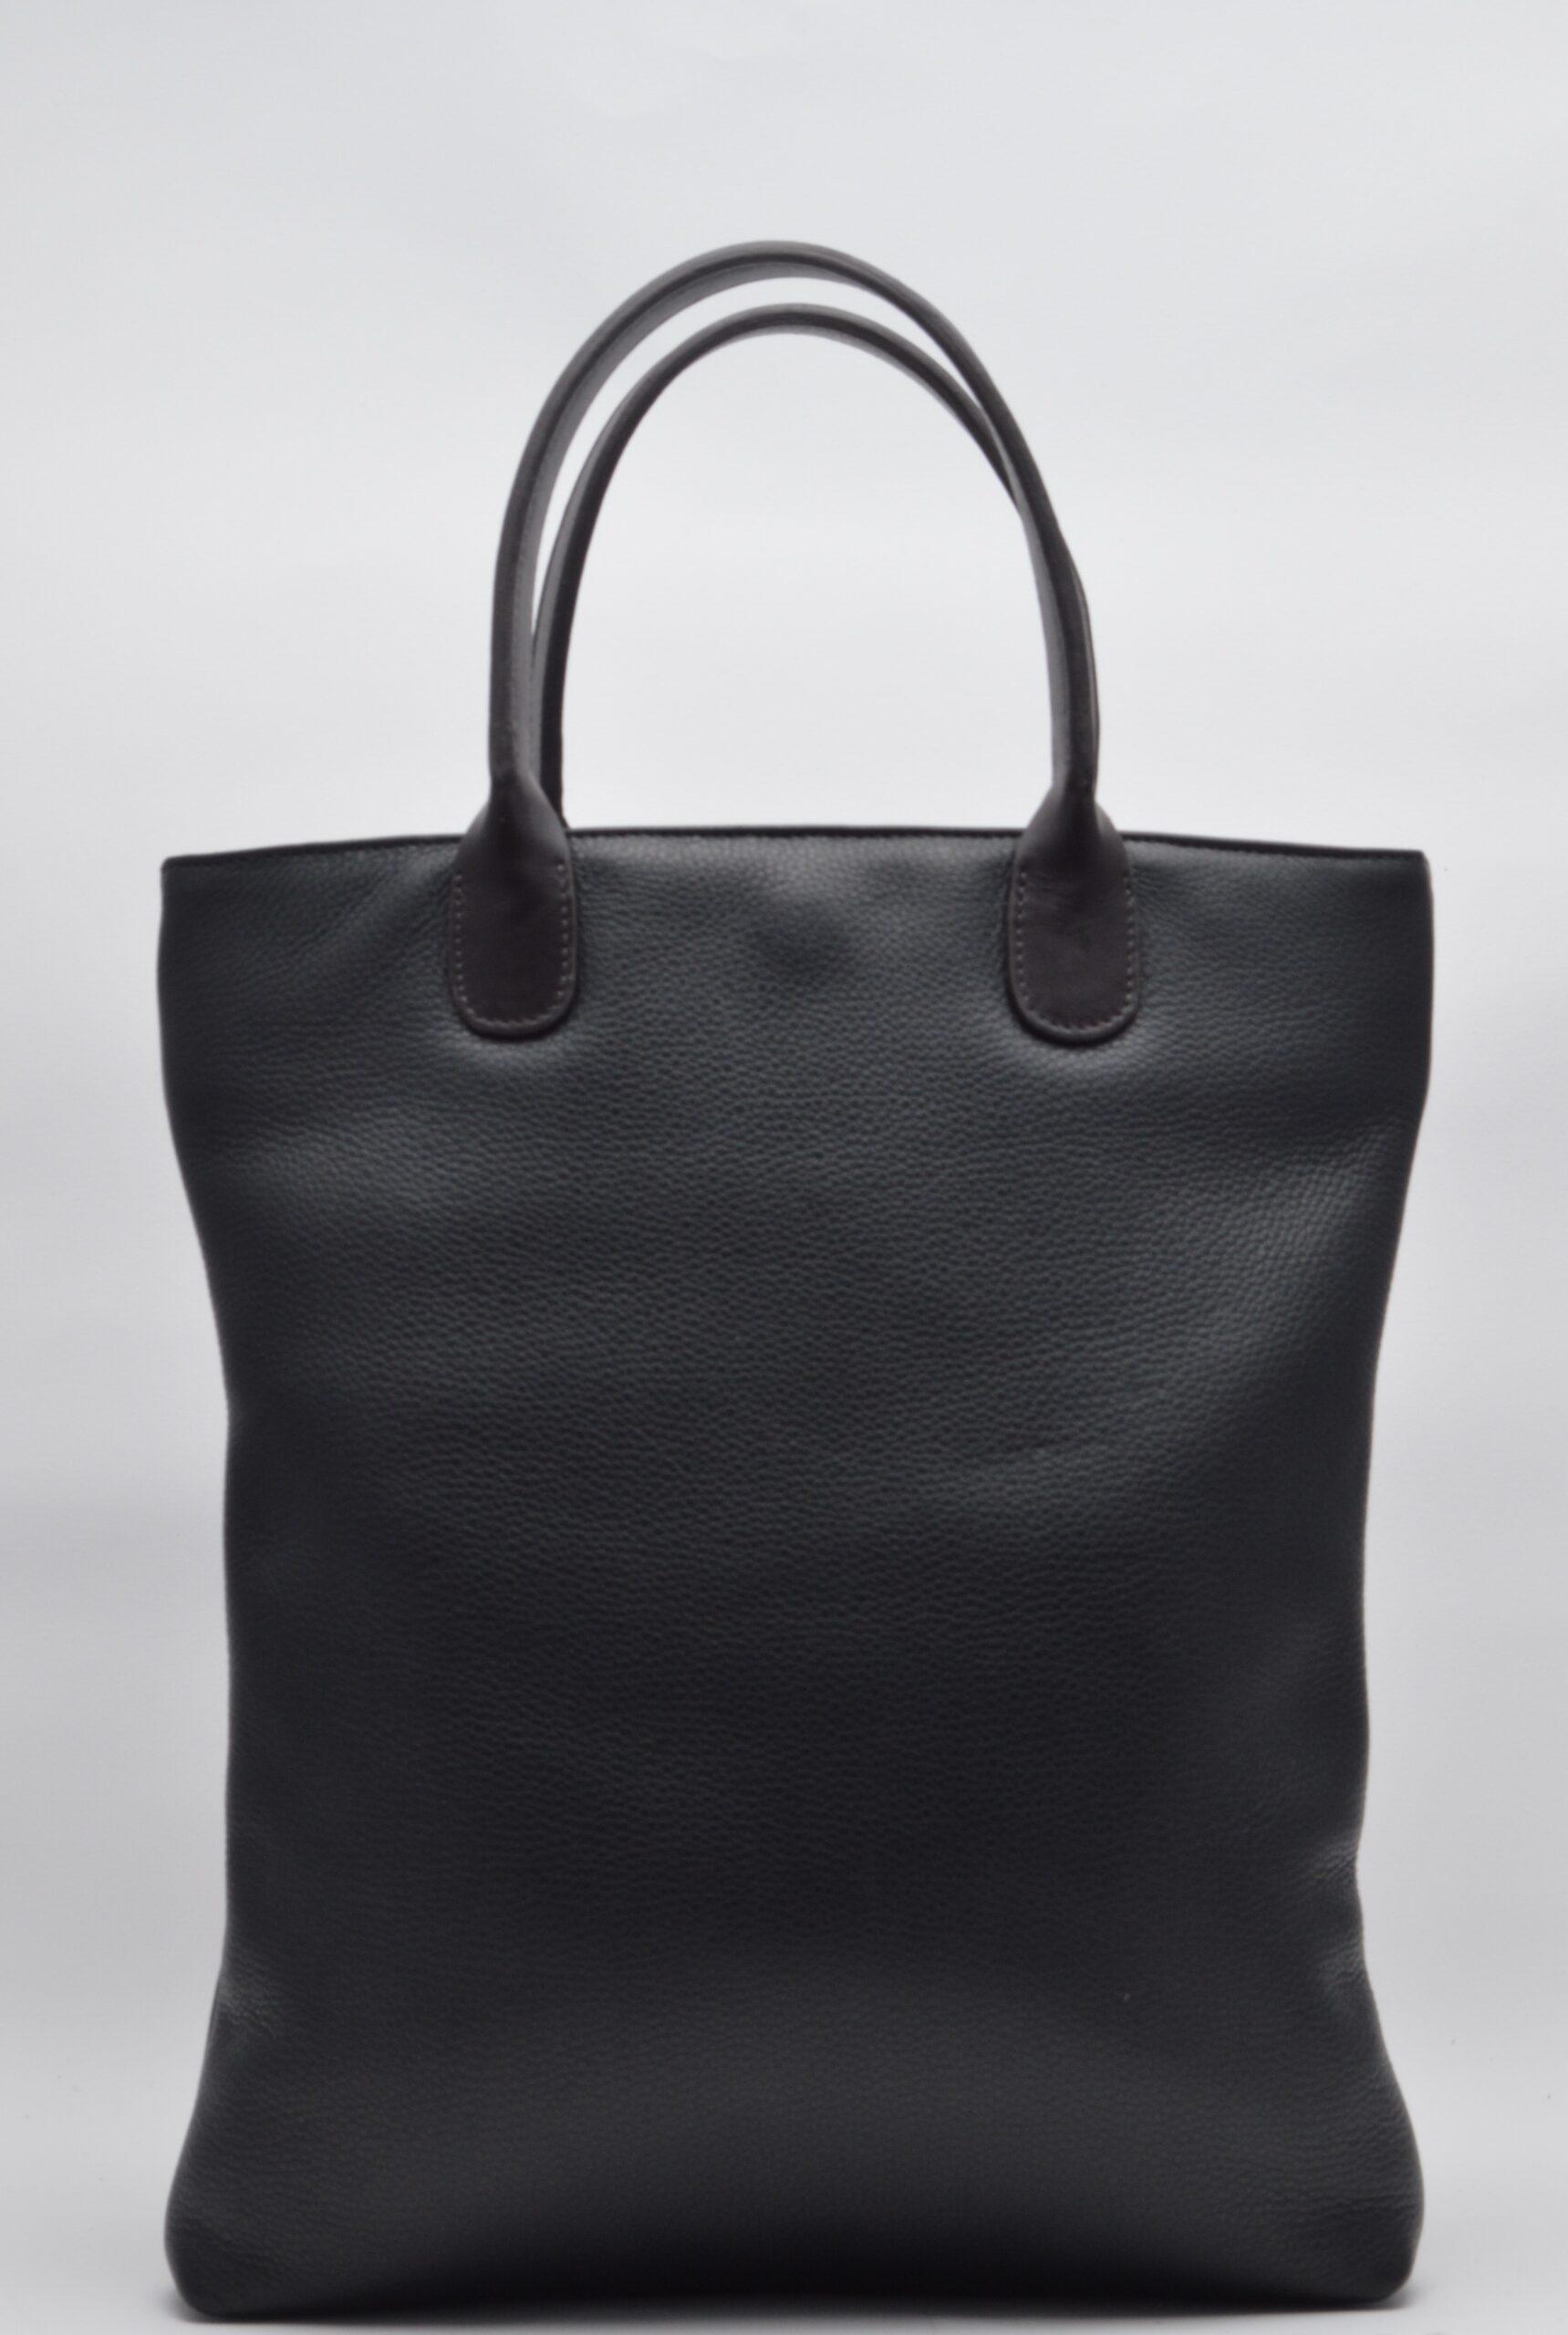 Bolsa Manga M Preta Leather Labs R´¢41900 8